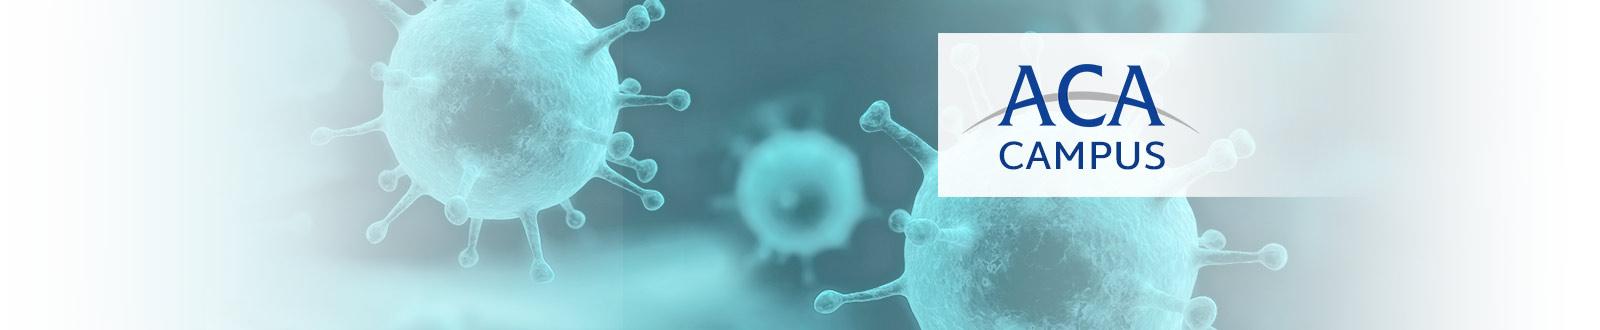 ACA-Campus-Biocides-header